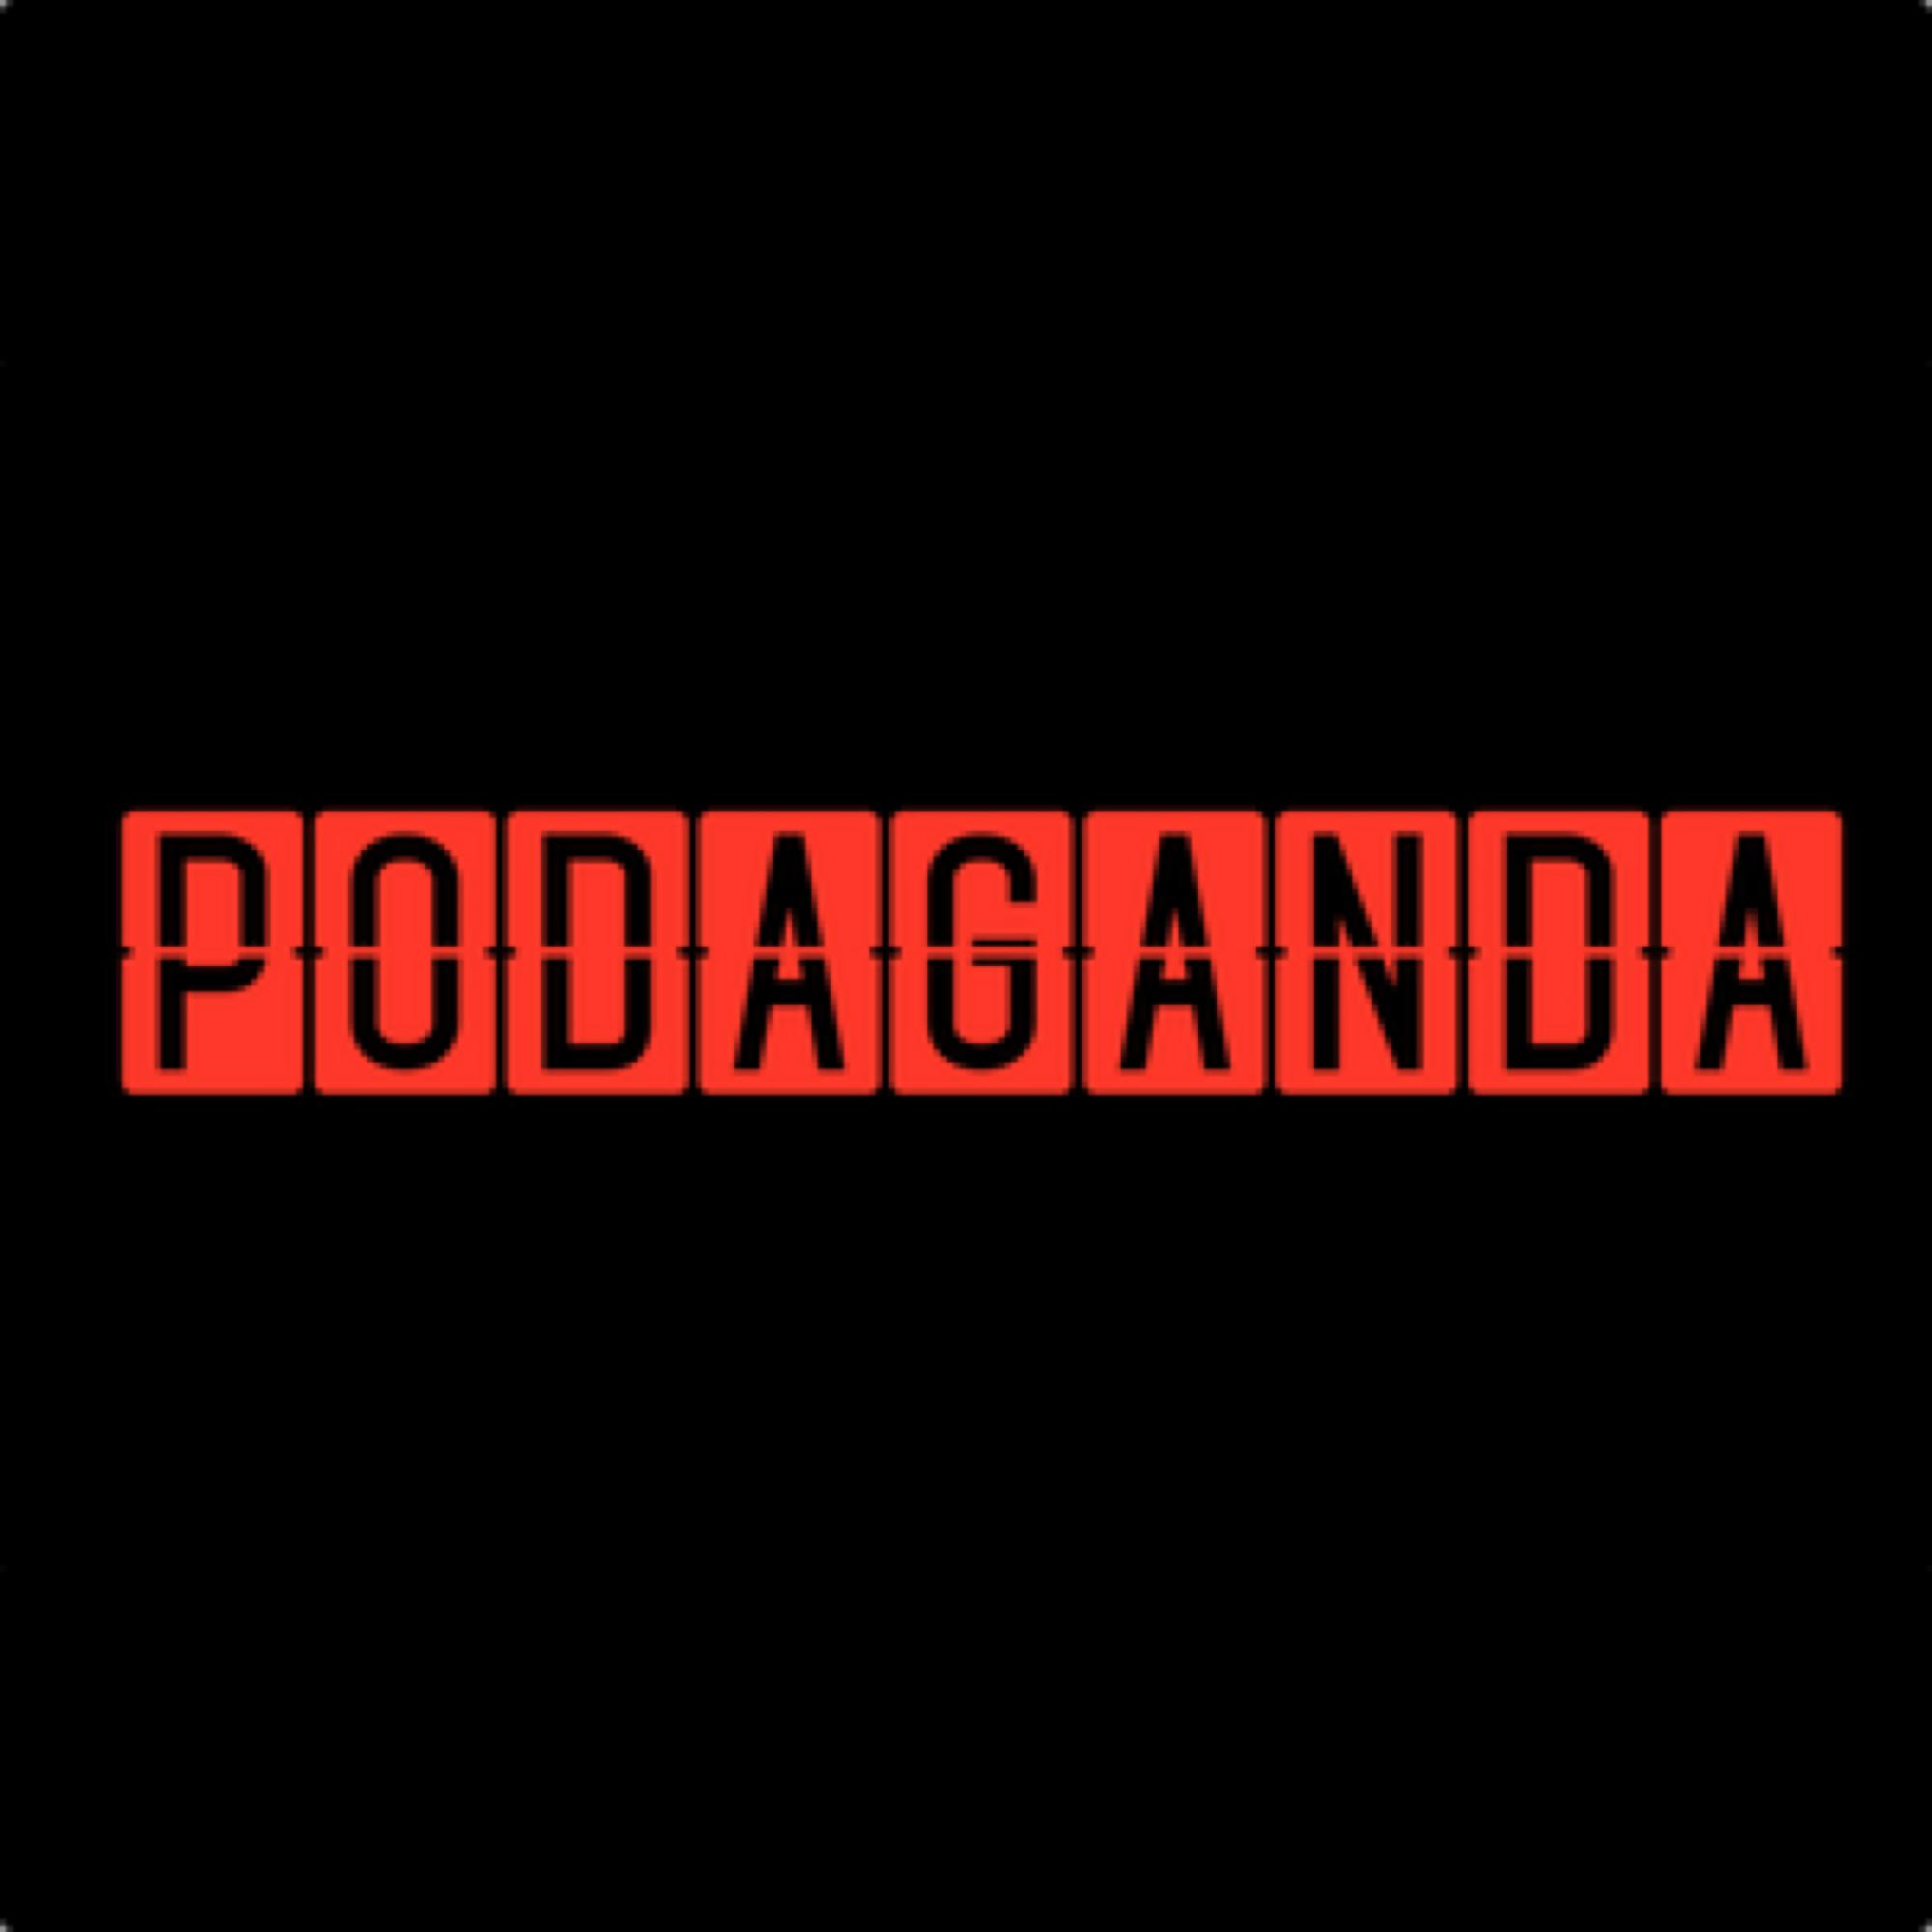 Podaganda show art